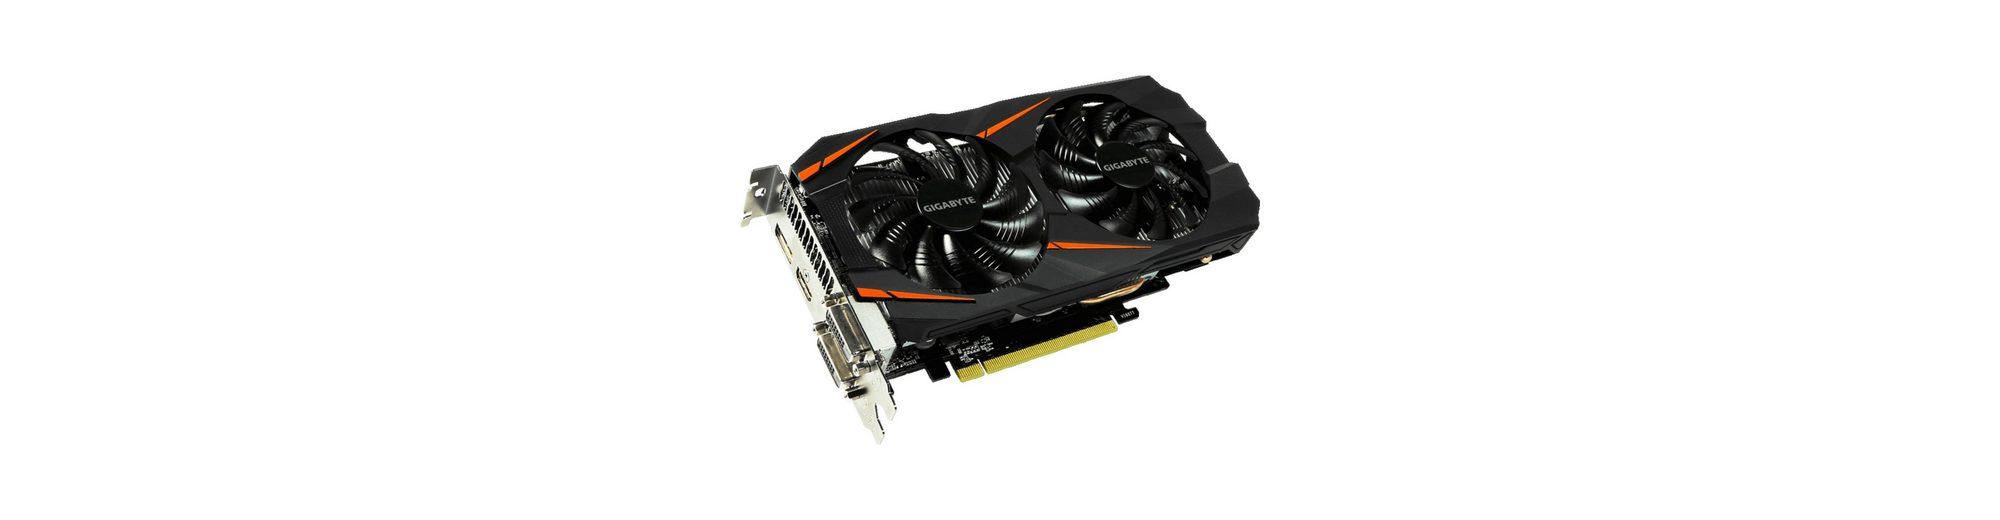 GIGABYTE Grafikkarte »GeForce GTX 1060 Windforce OC 3G«